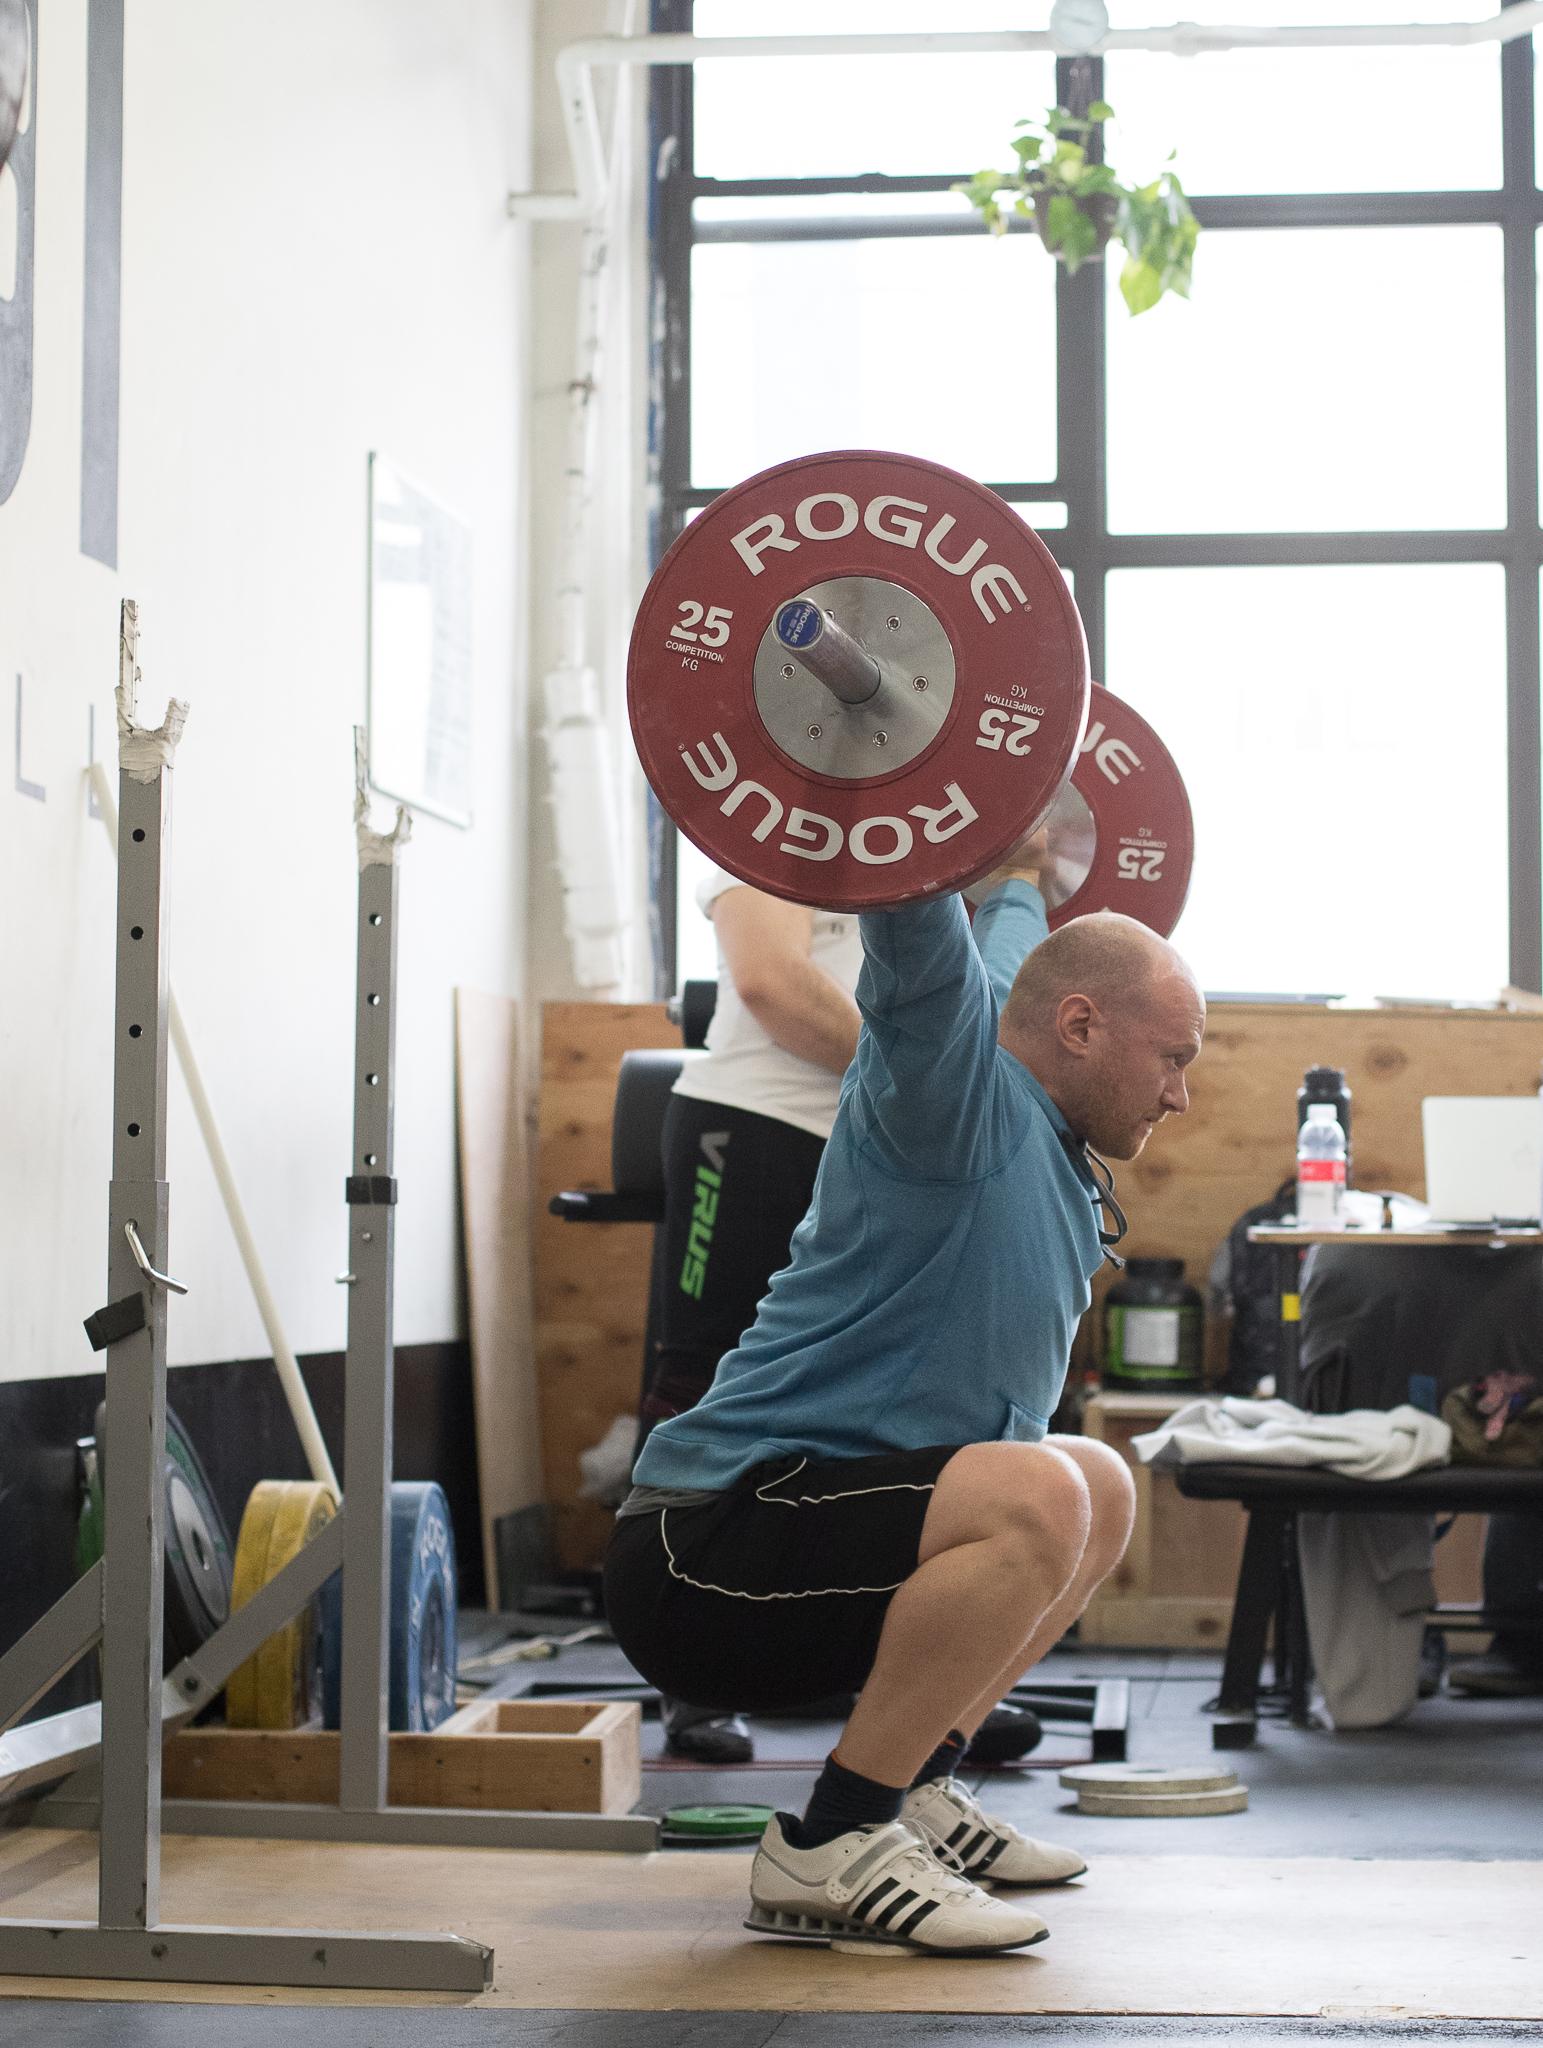 yasha-kahn-weightlifting-coach-24.jpg